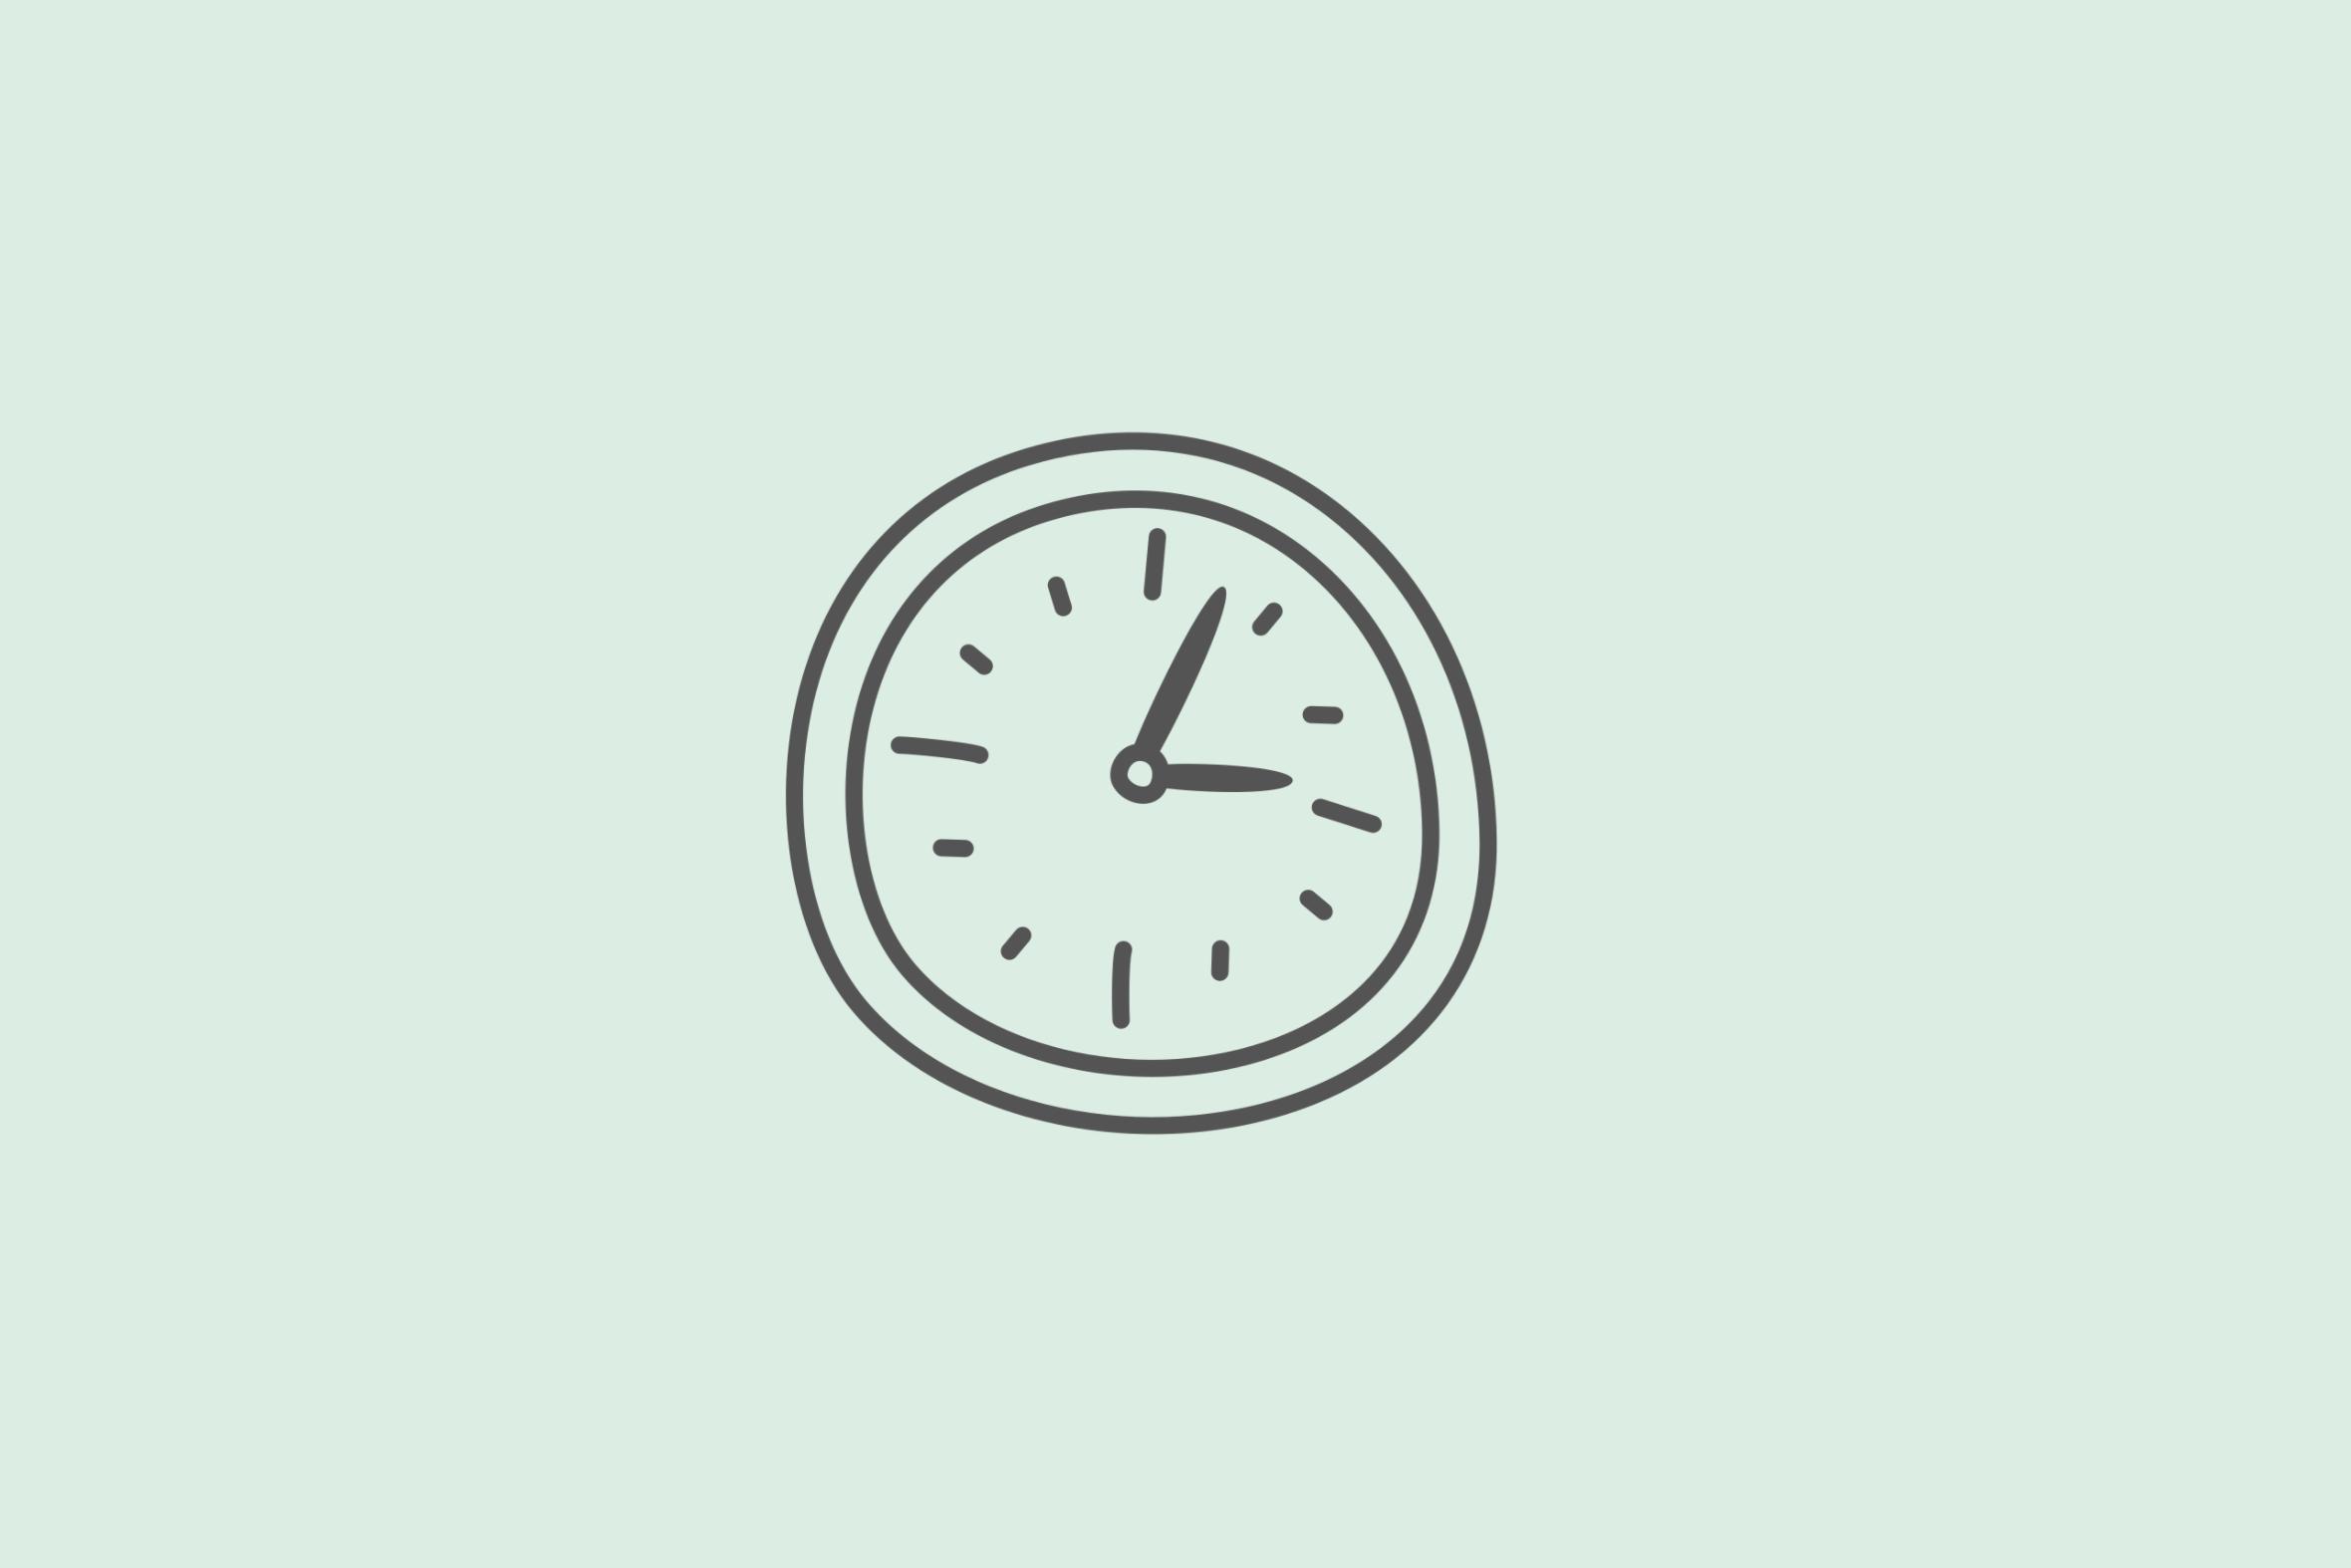 9. Kapitel: Alles eine Frage des Timings